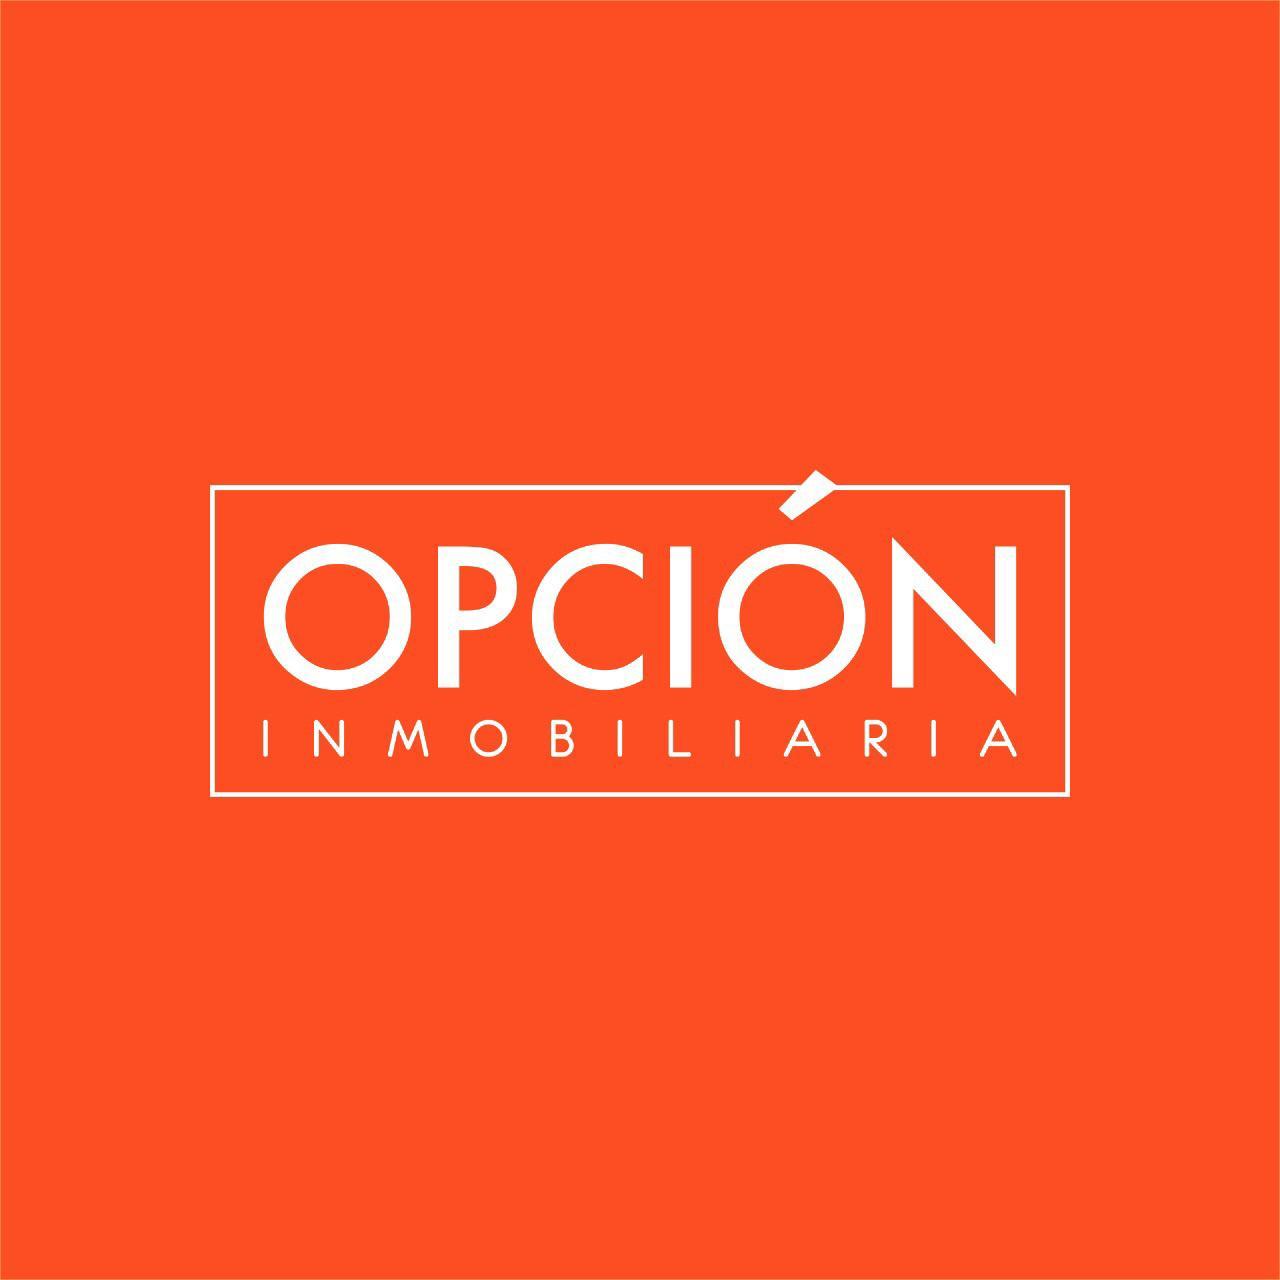 Logo de  Opcion Inmobiliaria